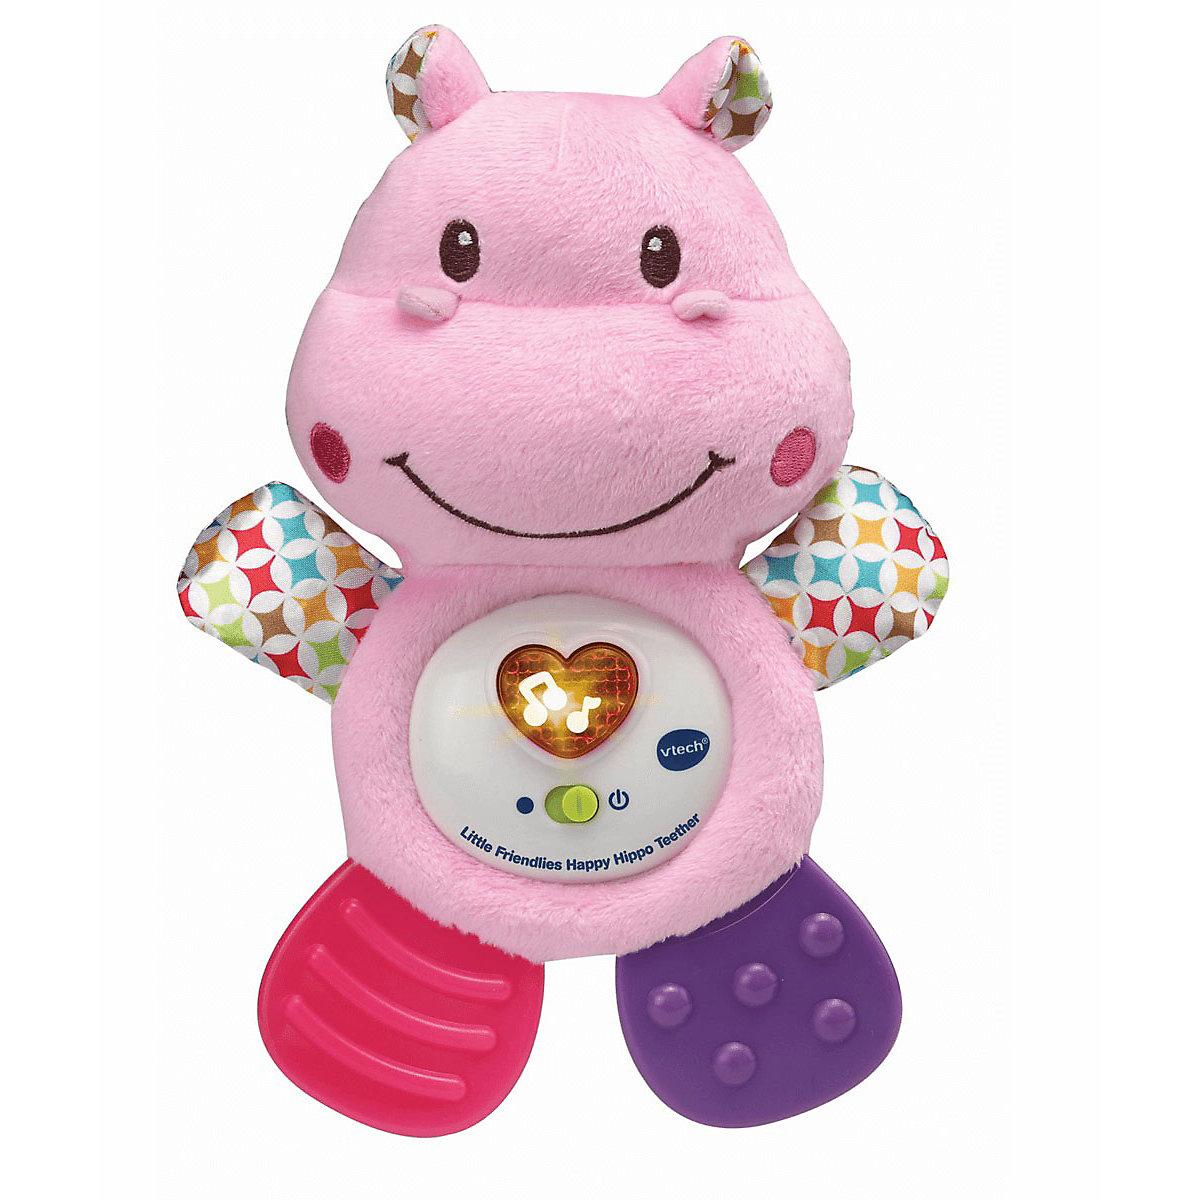 VTech Little Friendlies Happy Hippo Teether - Pink